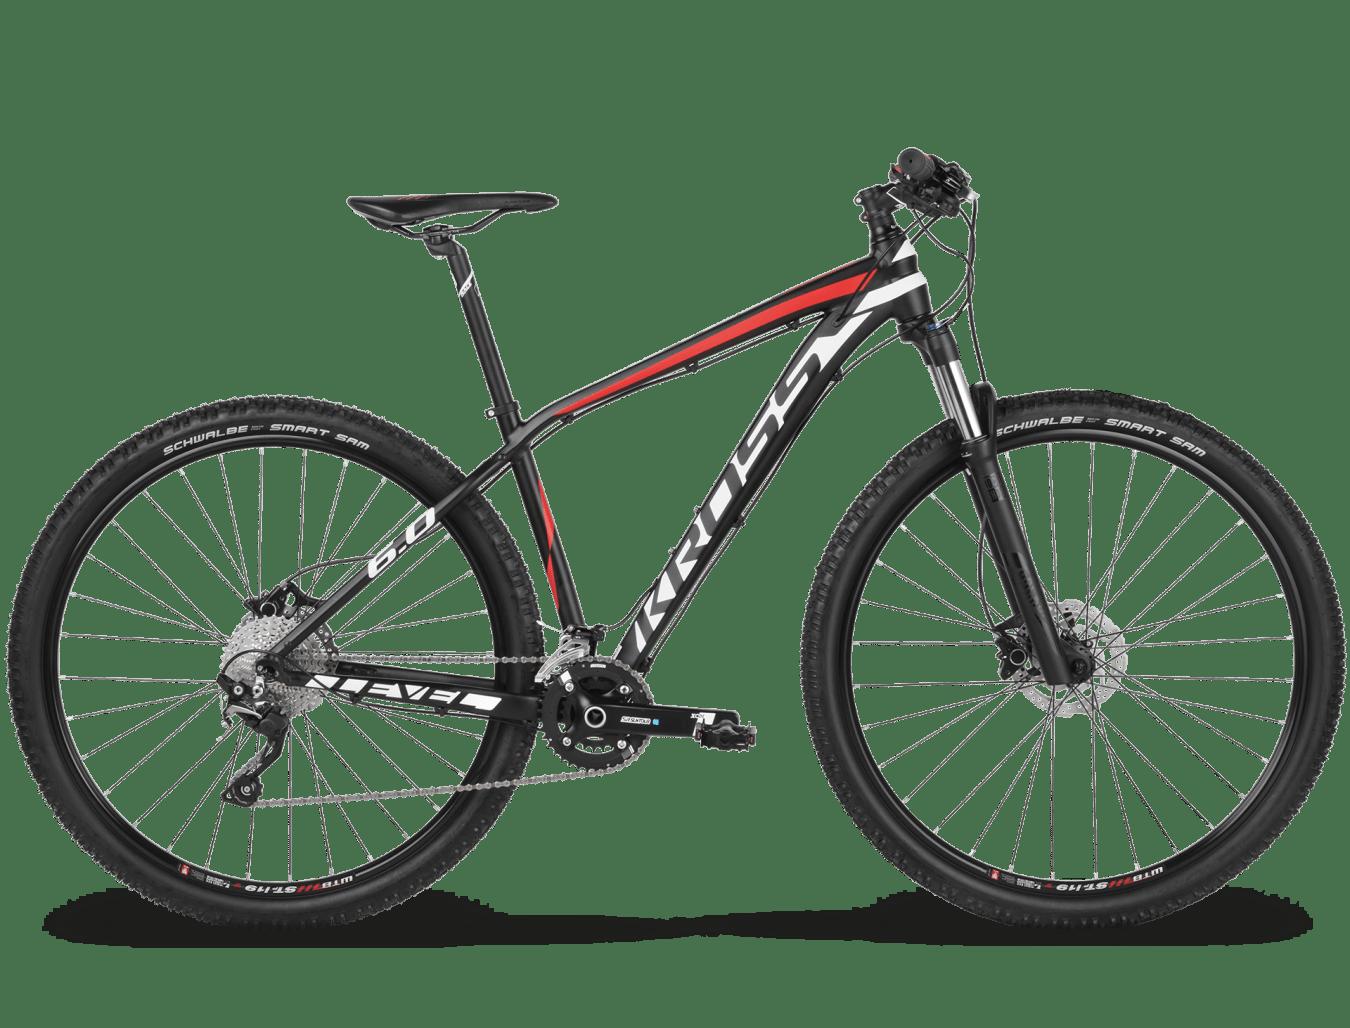 Bicicleta Kross Level 6 0 29 Negro Rojo Matte